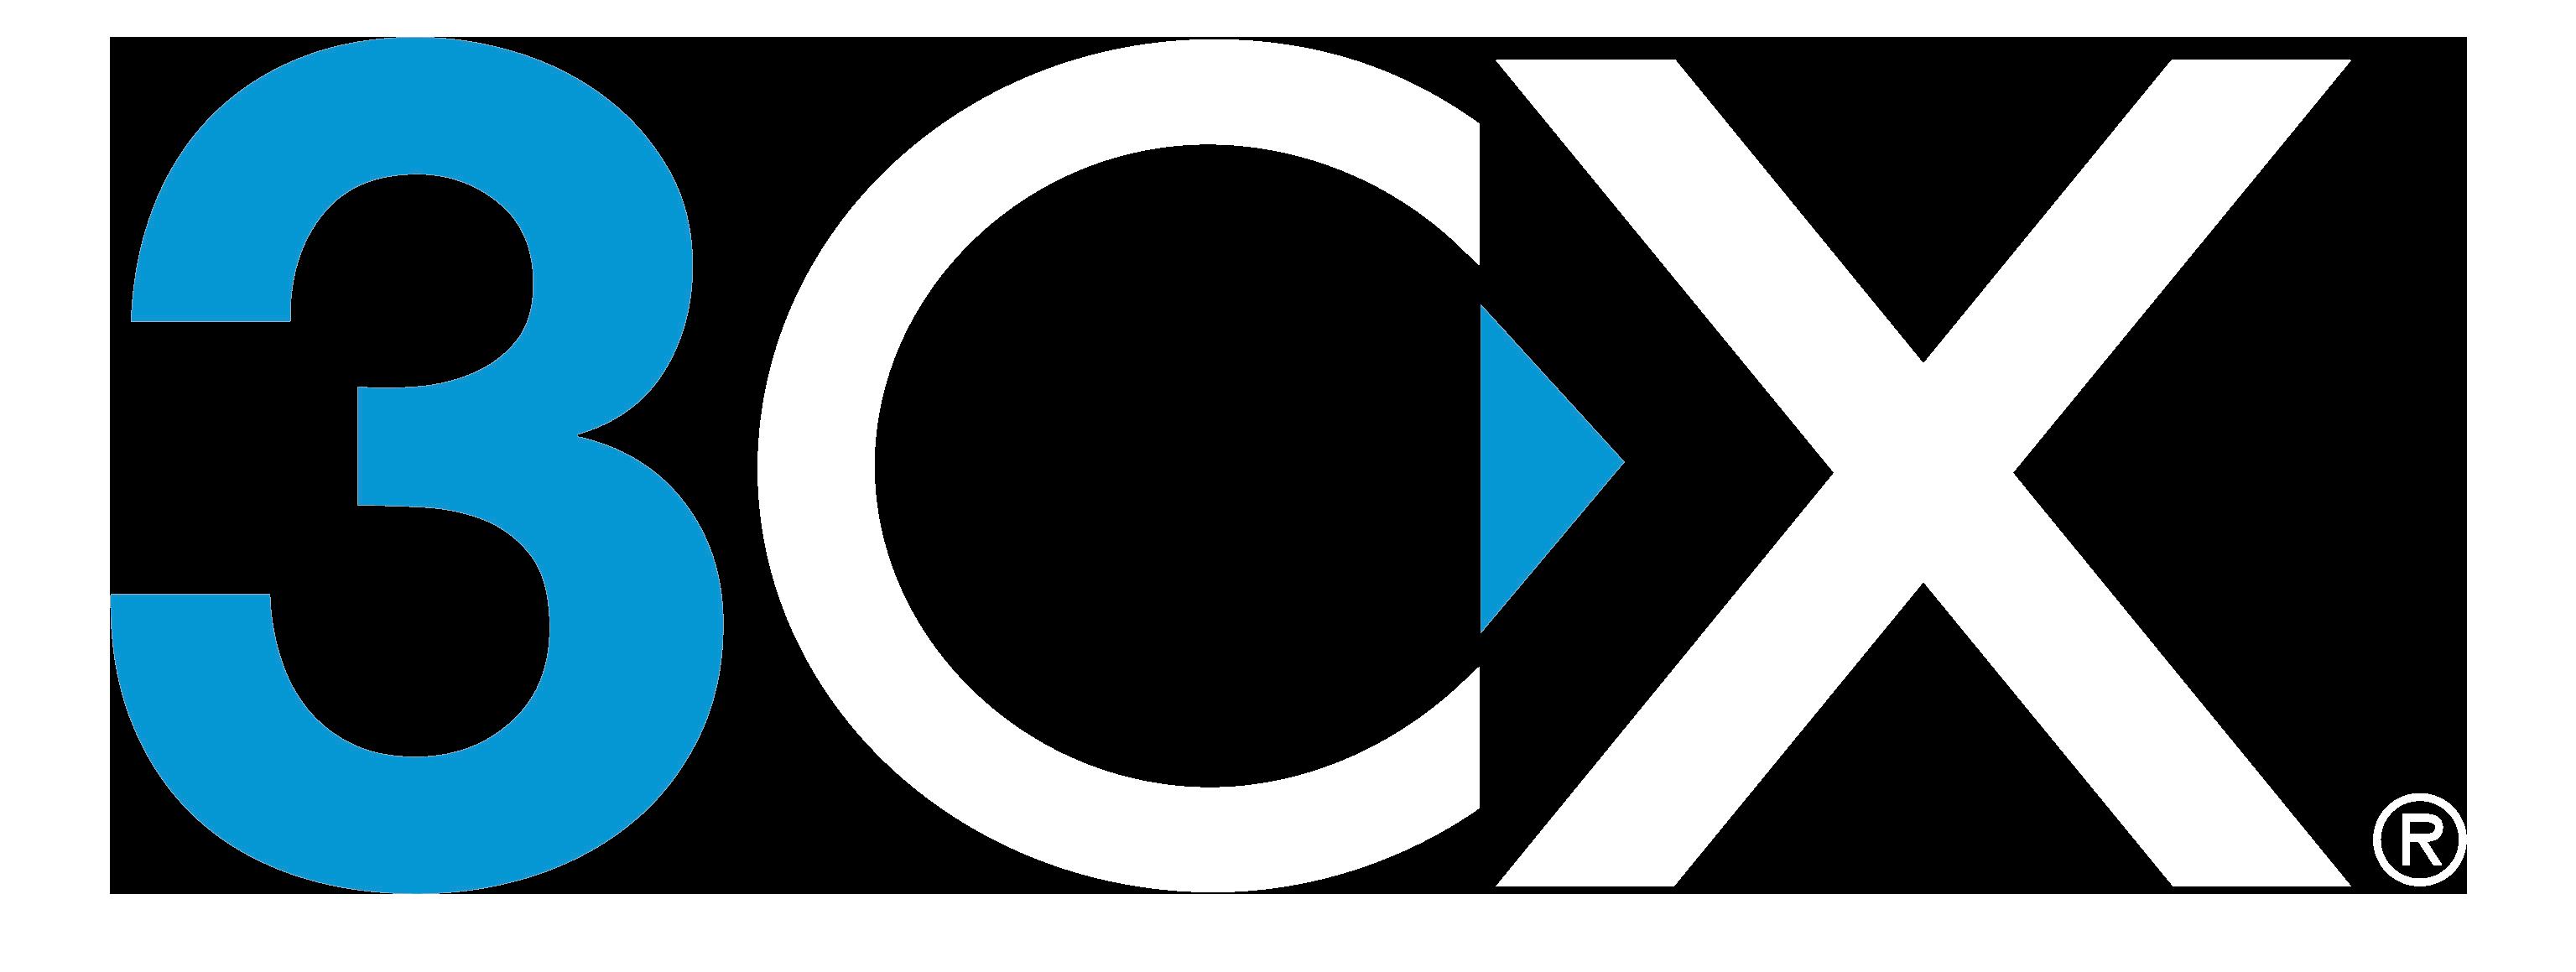 3CX Cloud PBX | Cloudbound IT